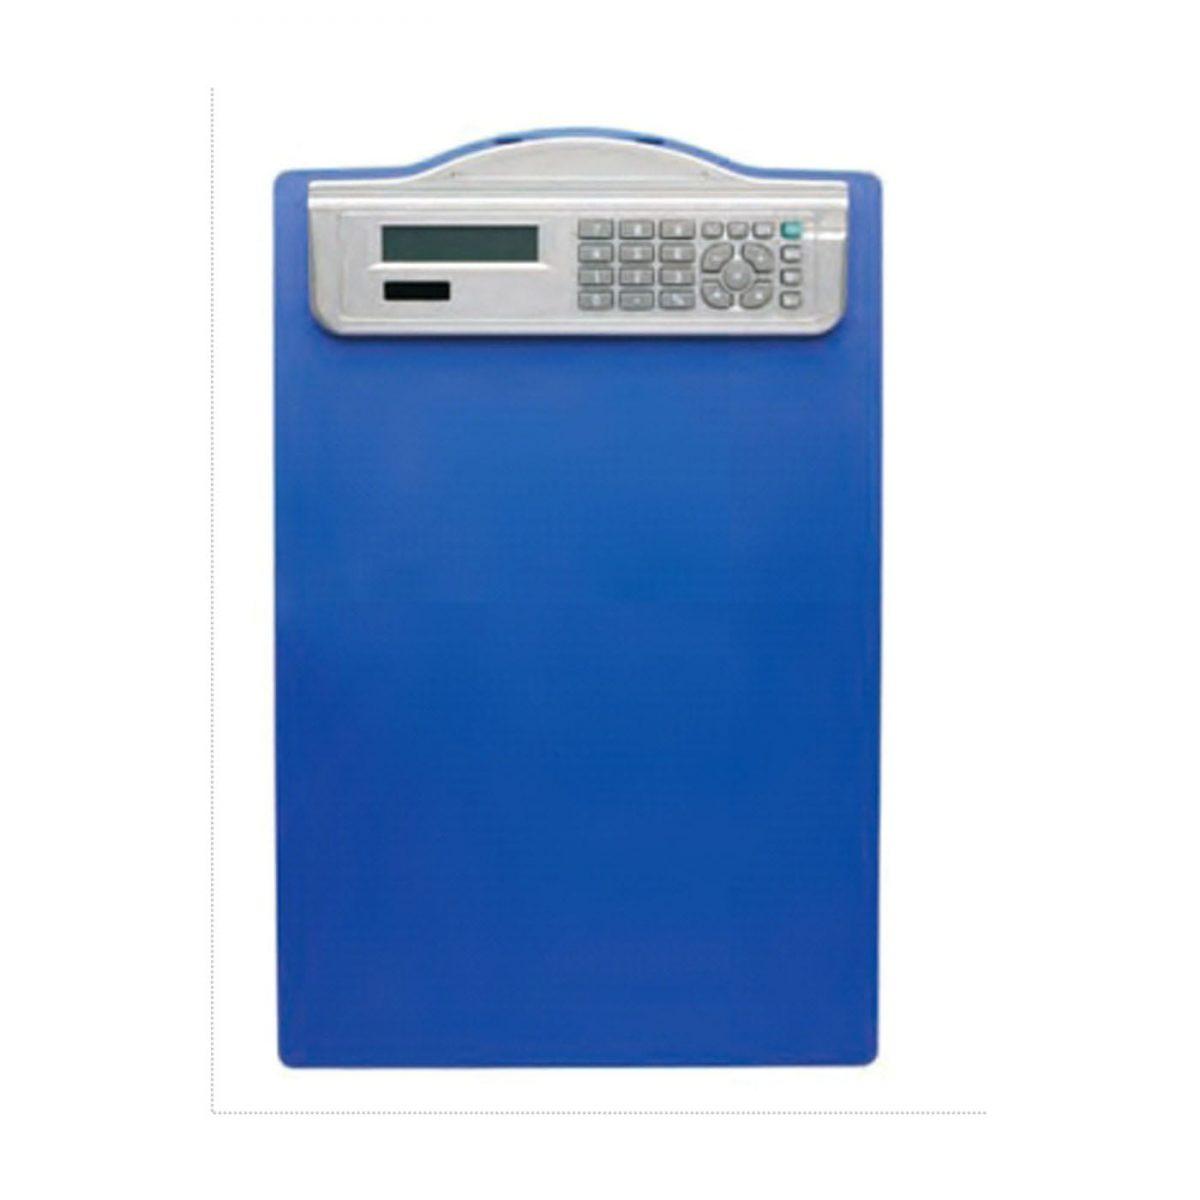 Clipboard simplu A4, din plastic rigid, cu calculator, ALCO